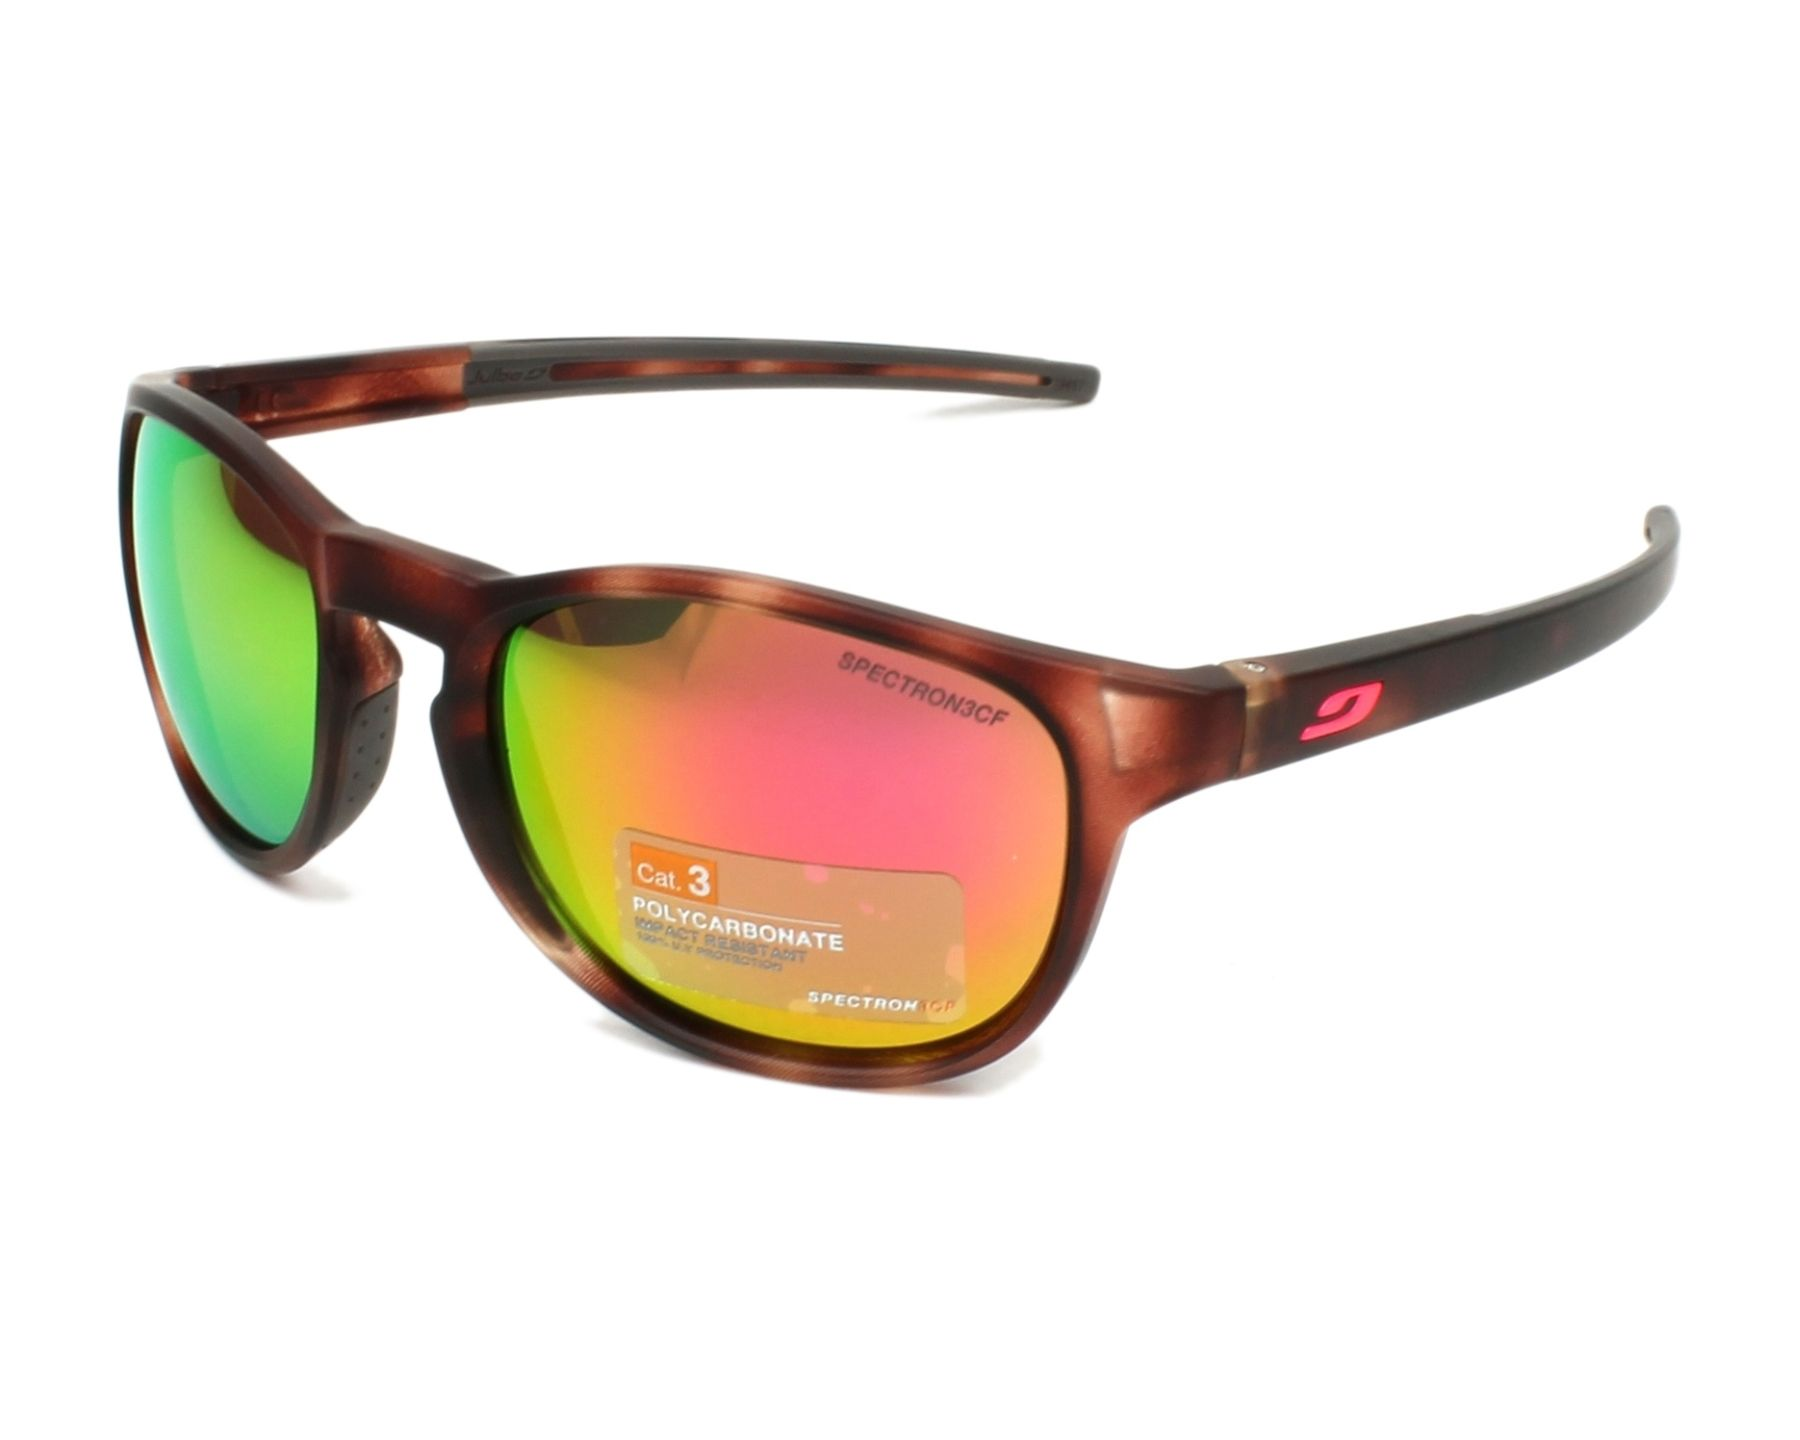 7600f8c1dd Sunglasses Julbo J503 1151 51-17 Havana profile view